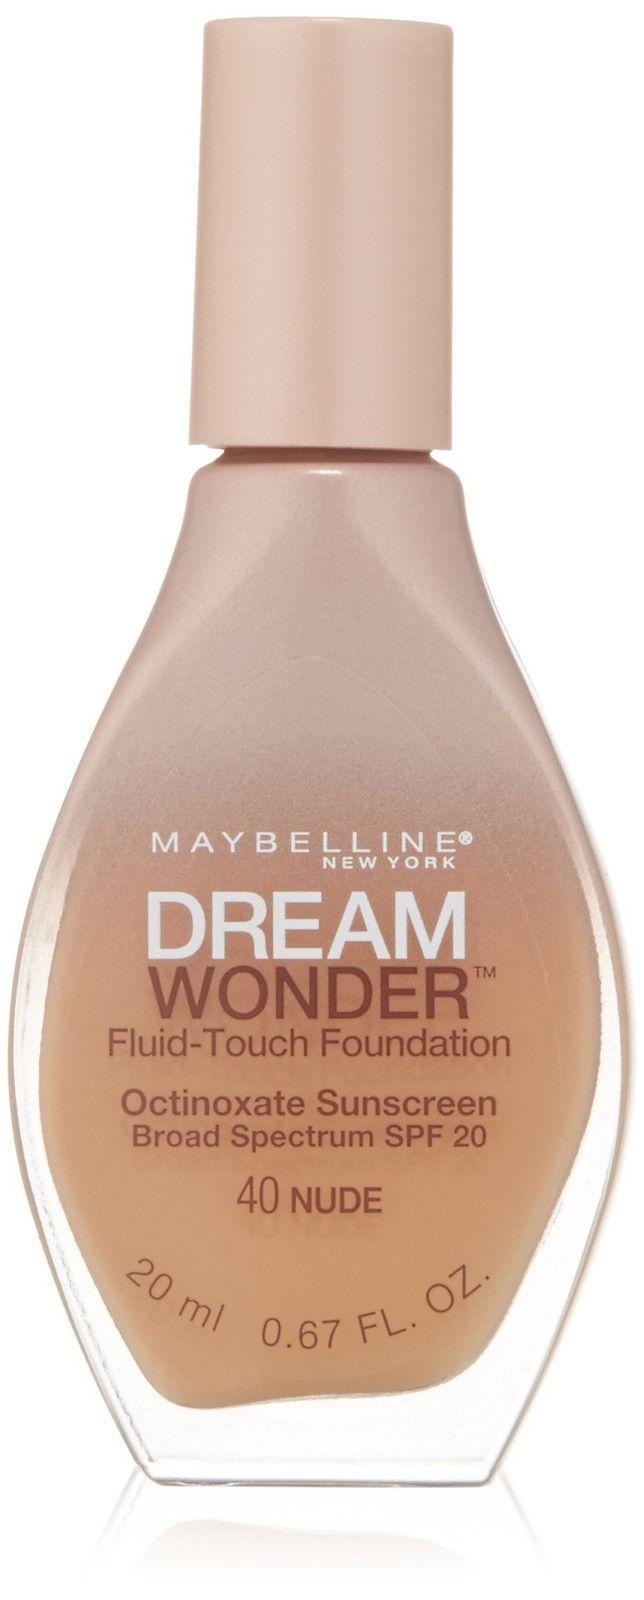 Maybelline New York Dream Wonder Fluid-touch Foundation Pick Ur Color